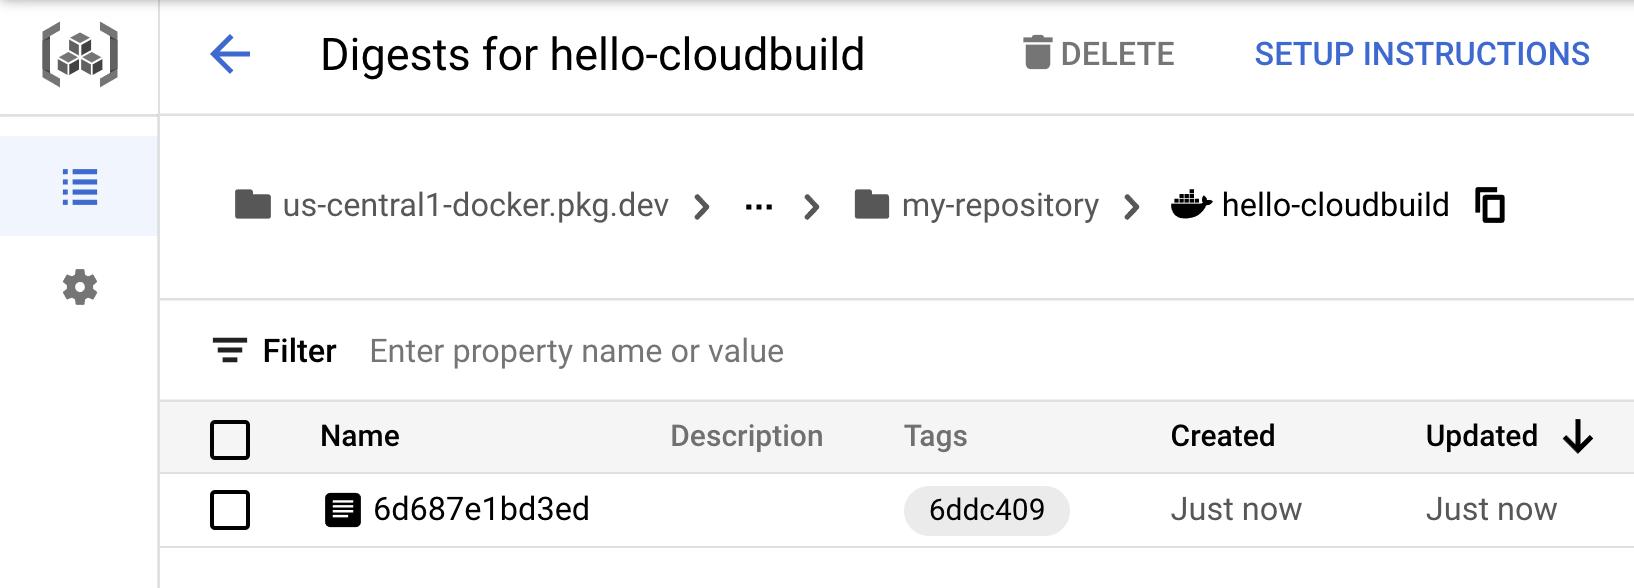 hello-cloudbuild image in Container Registry